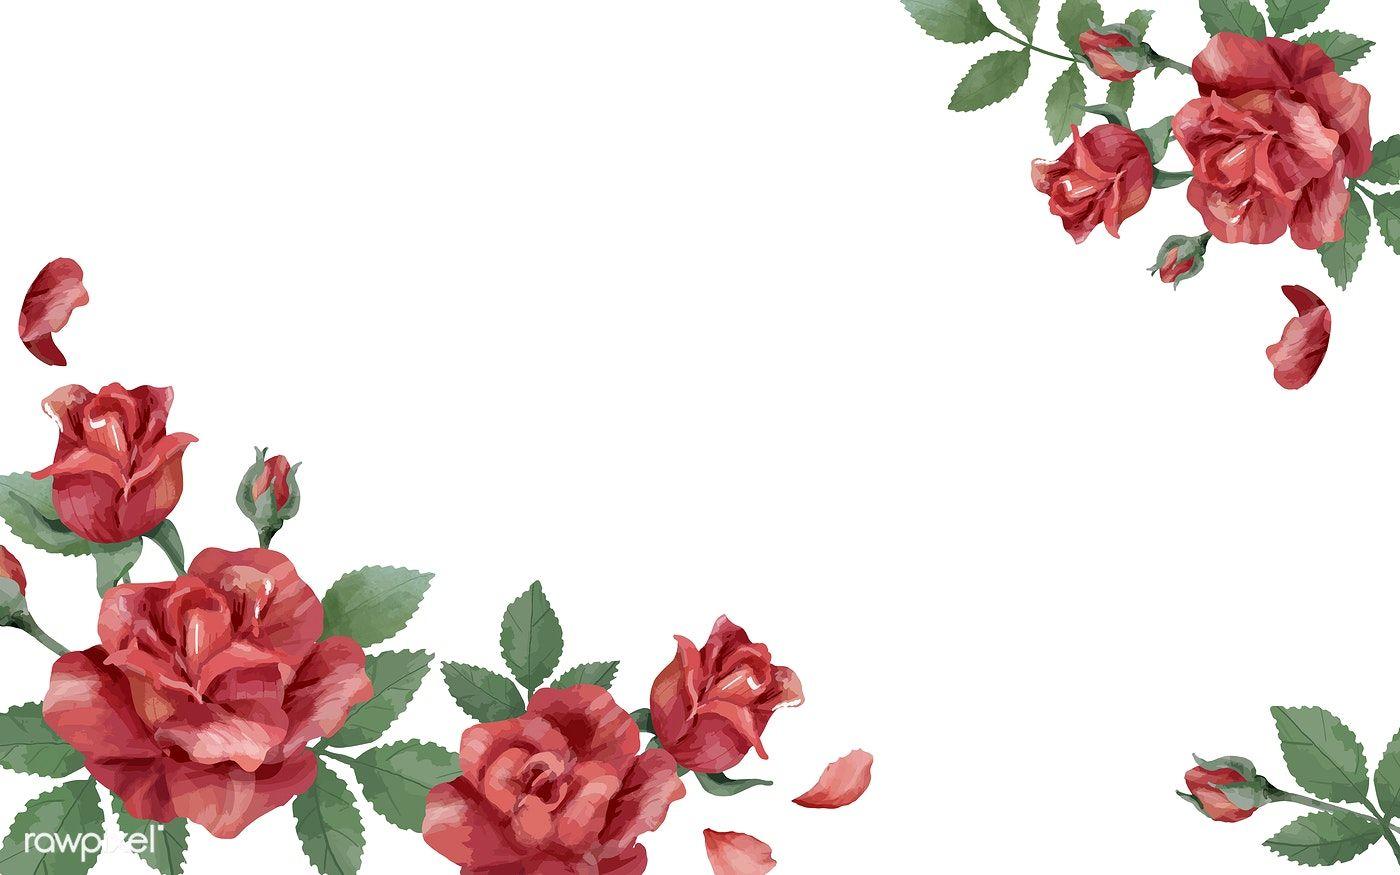 Download Premium Vector Of Invitation Card With A Red Color Scheme 466729 Paper Background Design Red Color Schemes Floral Border Design